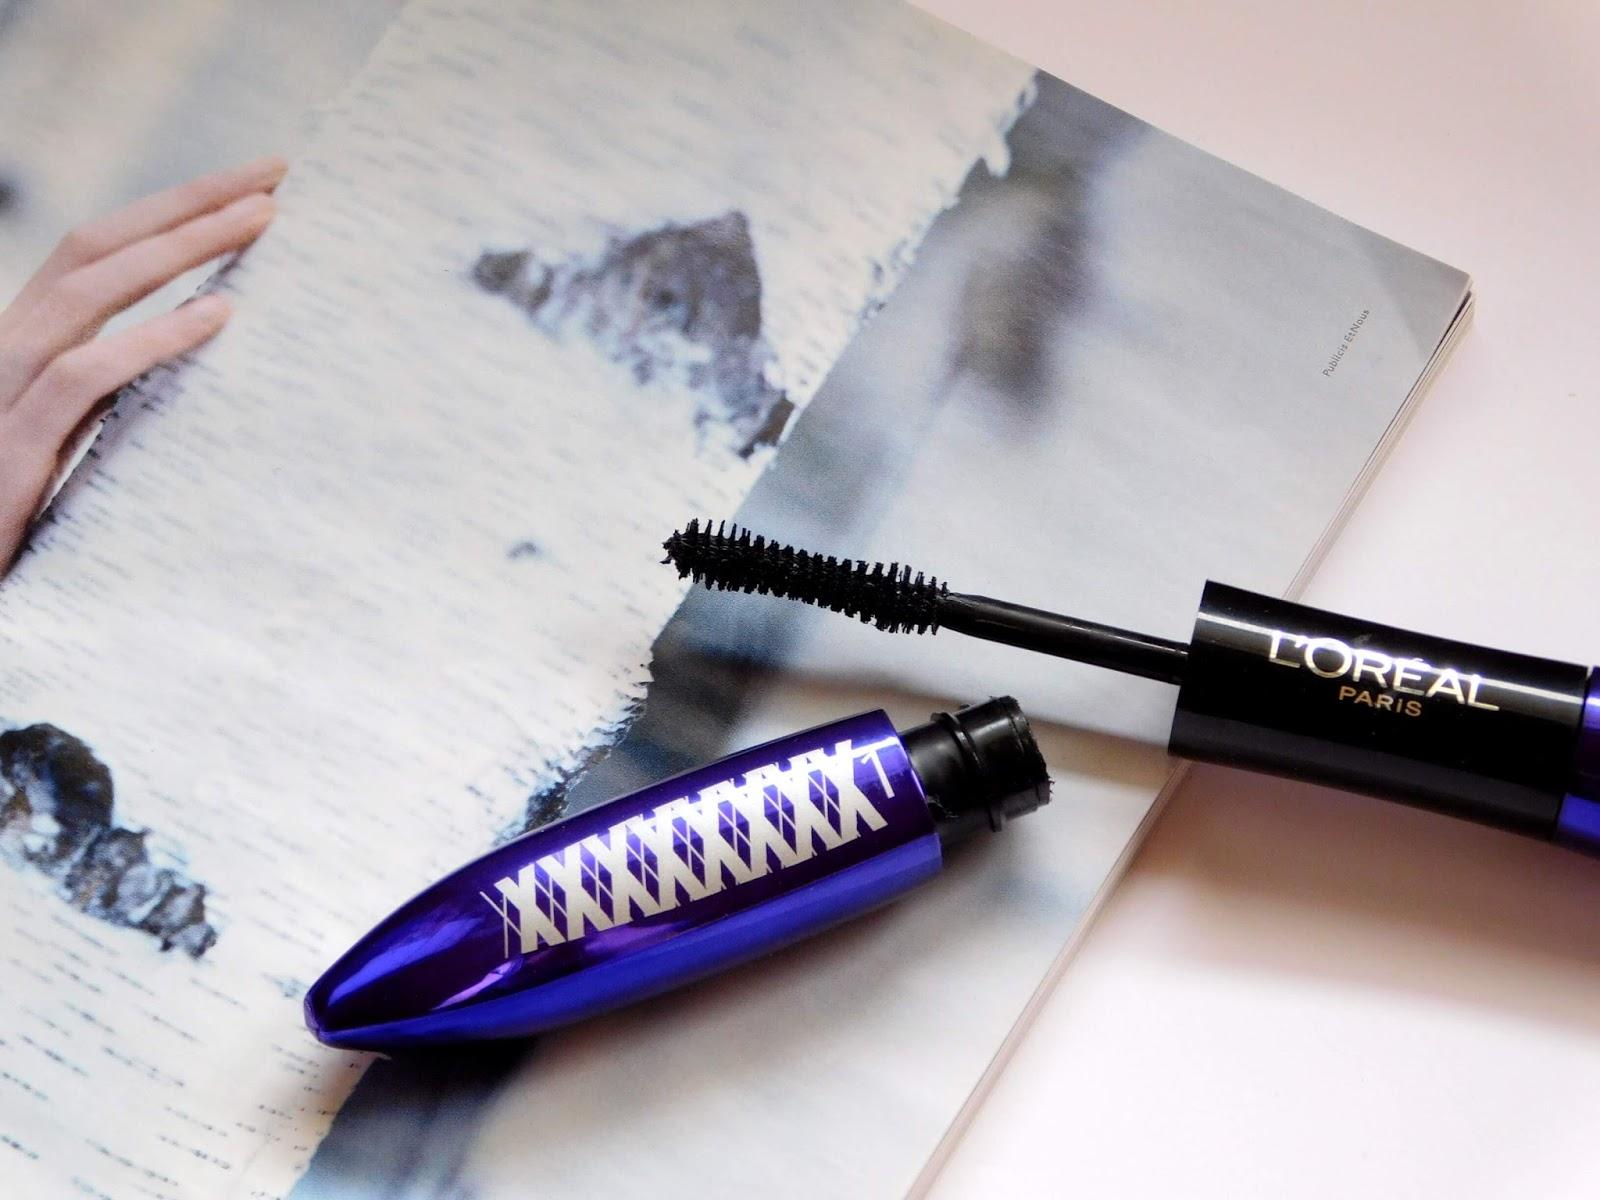 le mascara faux cils superstar x fiber de l 39 or al ausseanne. Black Bedroom Furniture Sets. Home Design Ideas